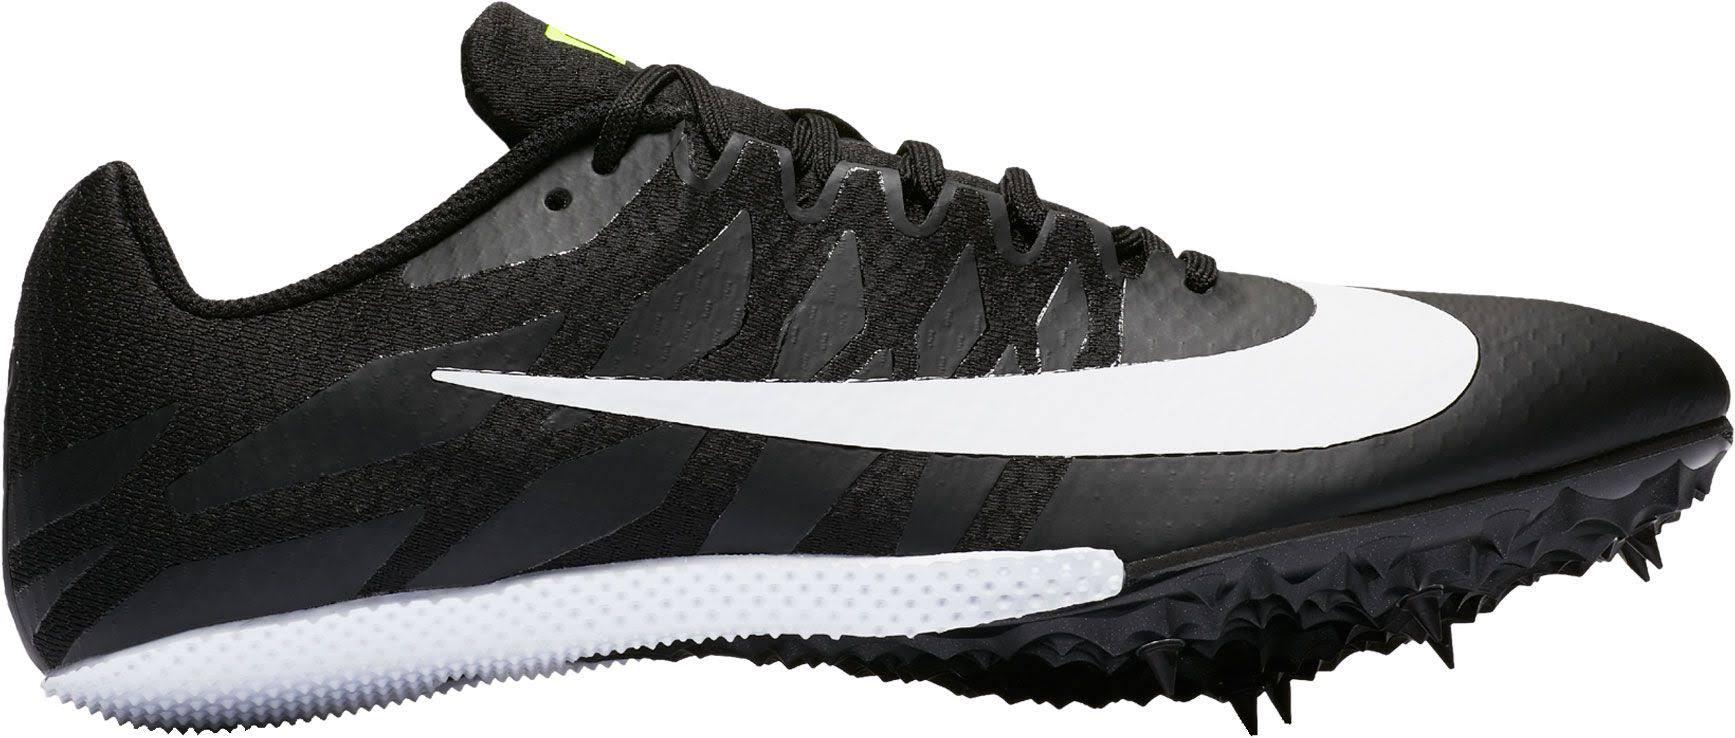 907564 Nike Volt Negro S Zoom 5 unisex 017 9 Blanco Rival 9 AxYZr0qwA